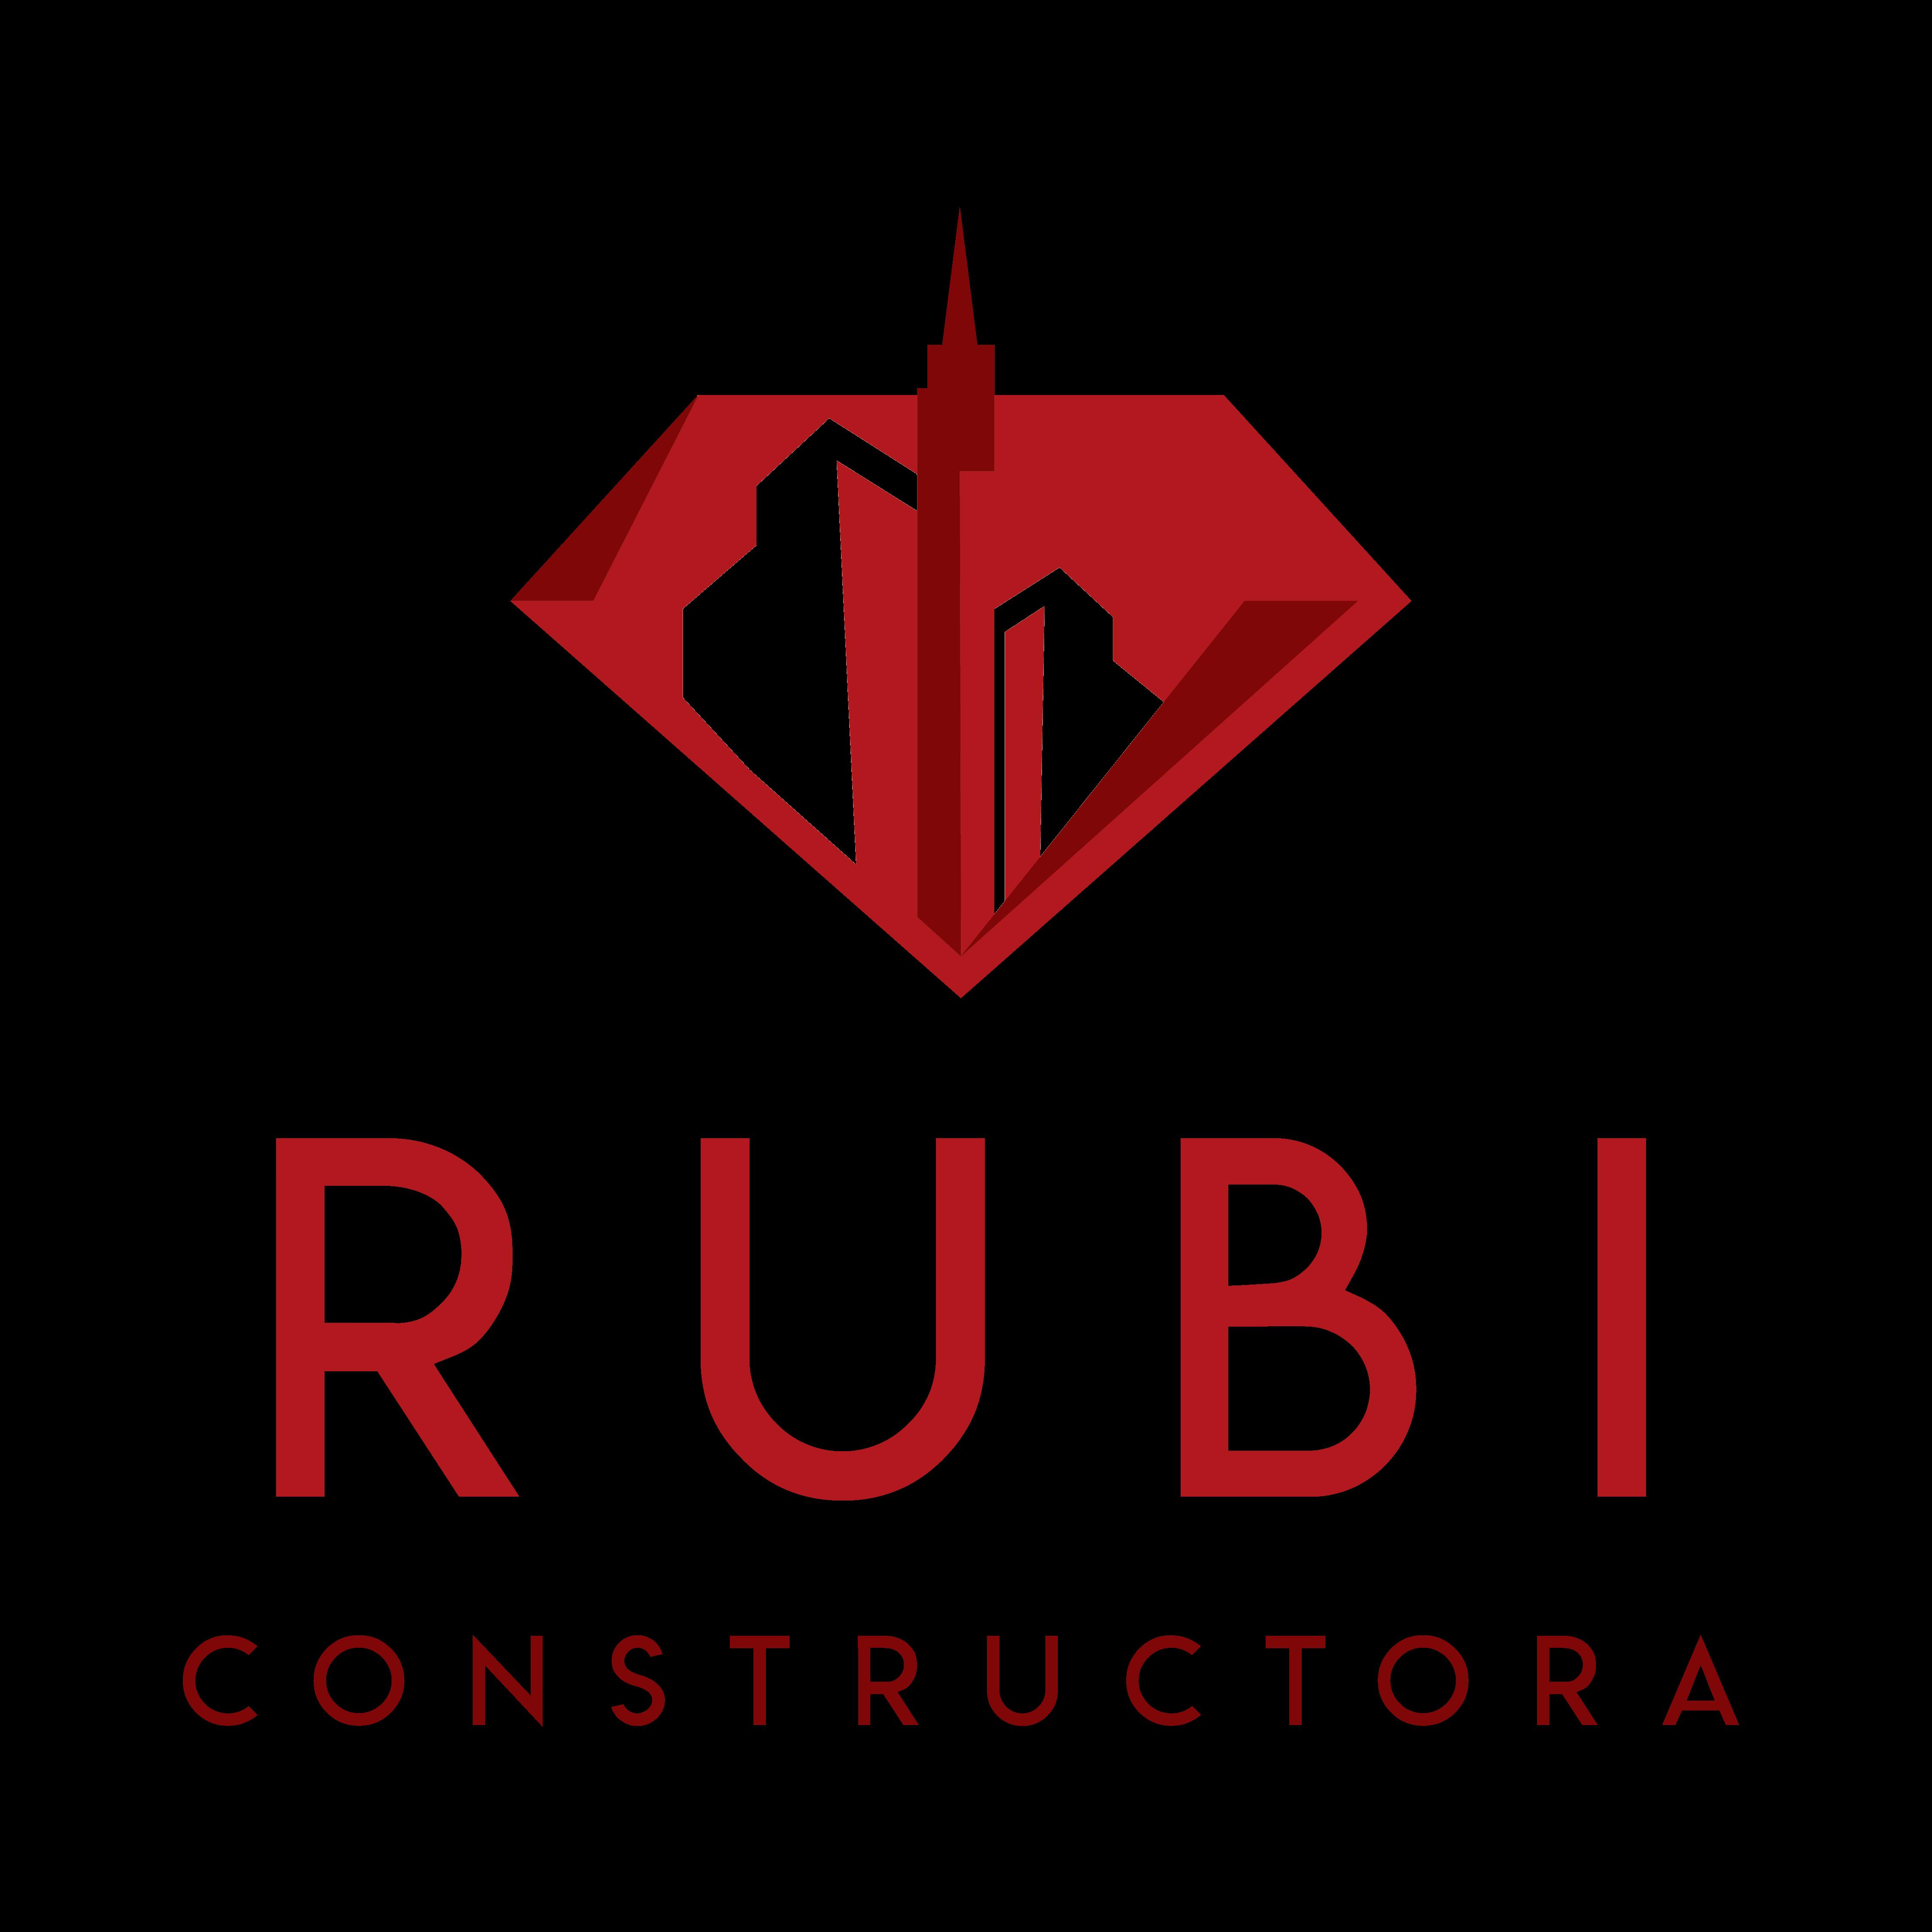 Rubi Constructora